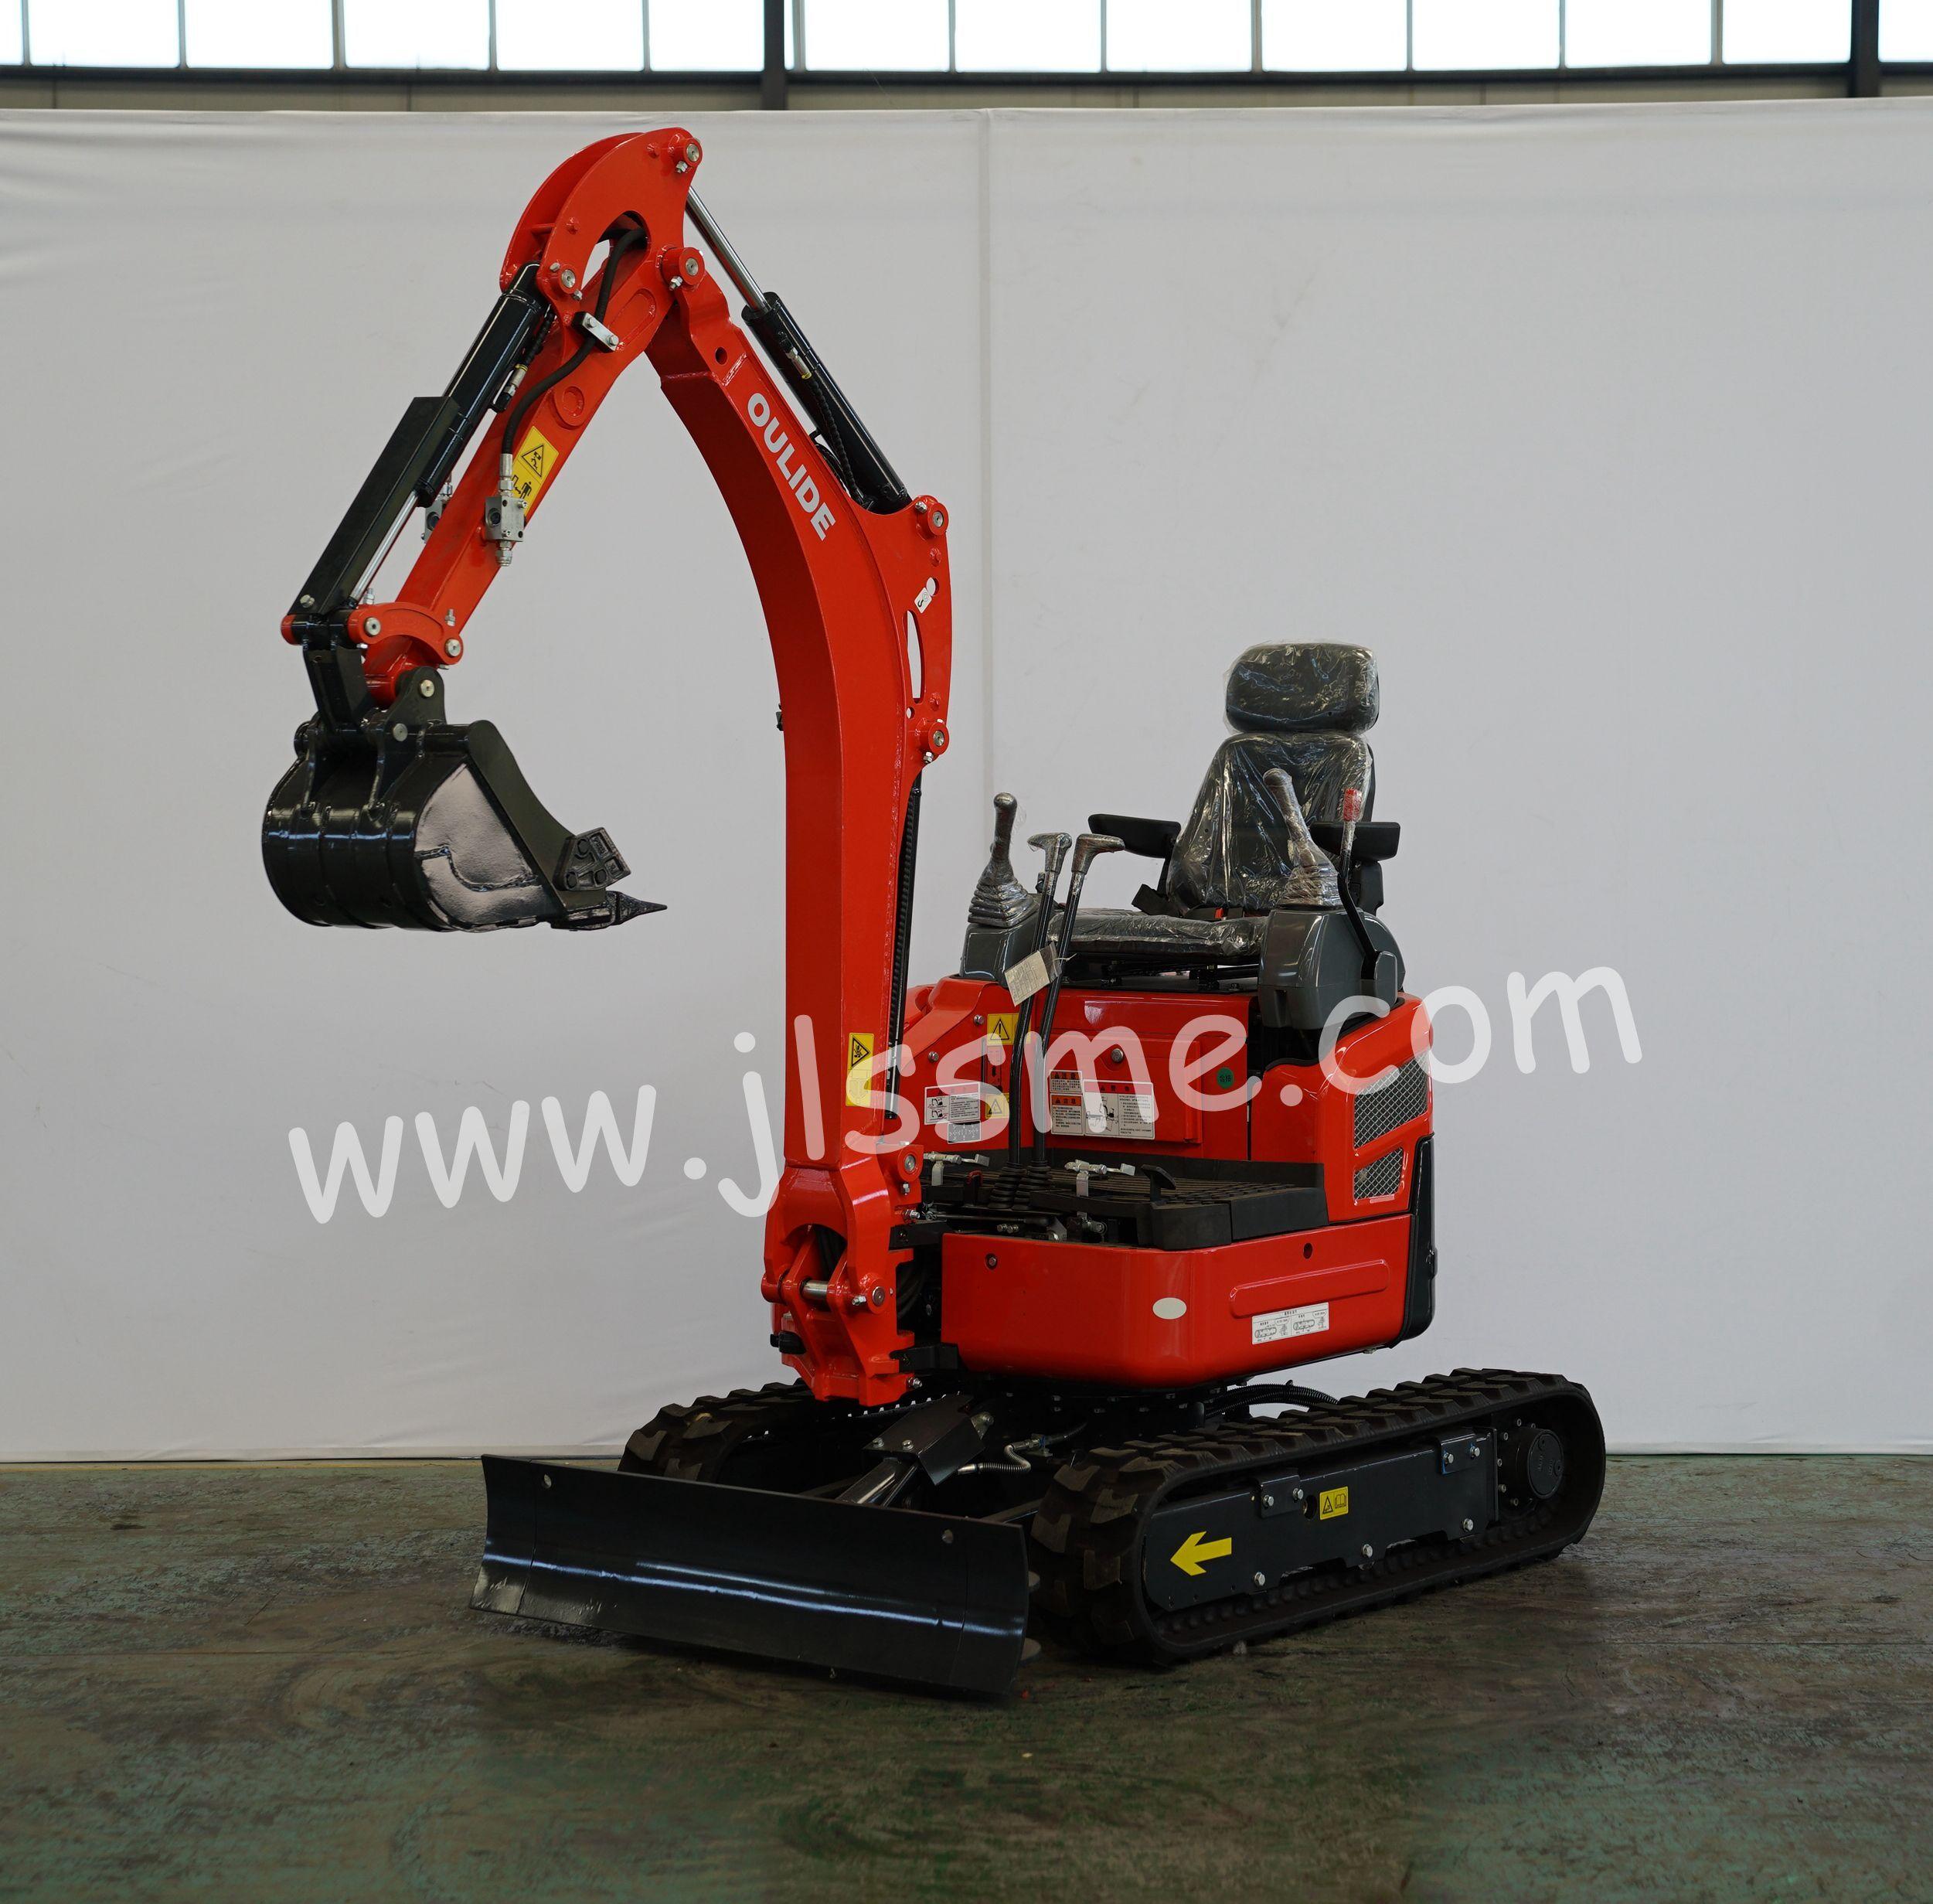 Main parameters of this mini excavator Operating weight